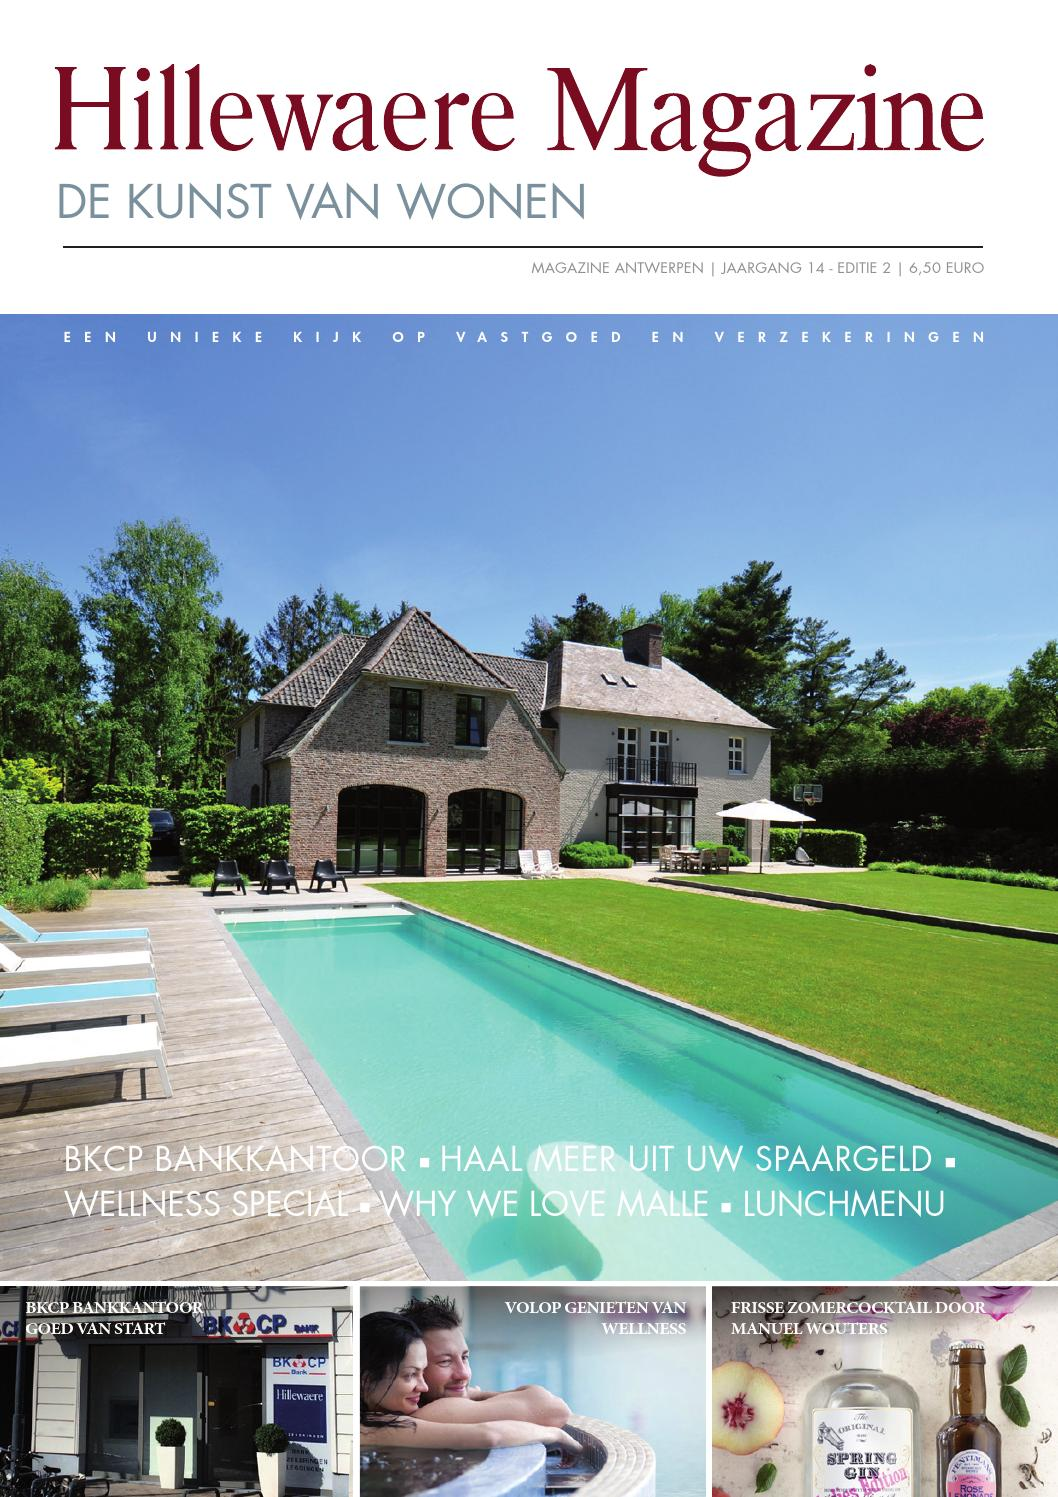 Hillewaere Magazine Jaargang 14, Editie 2 by Hillewaere - issuu